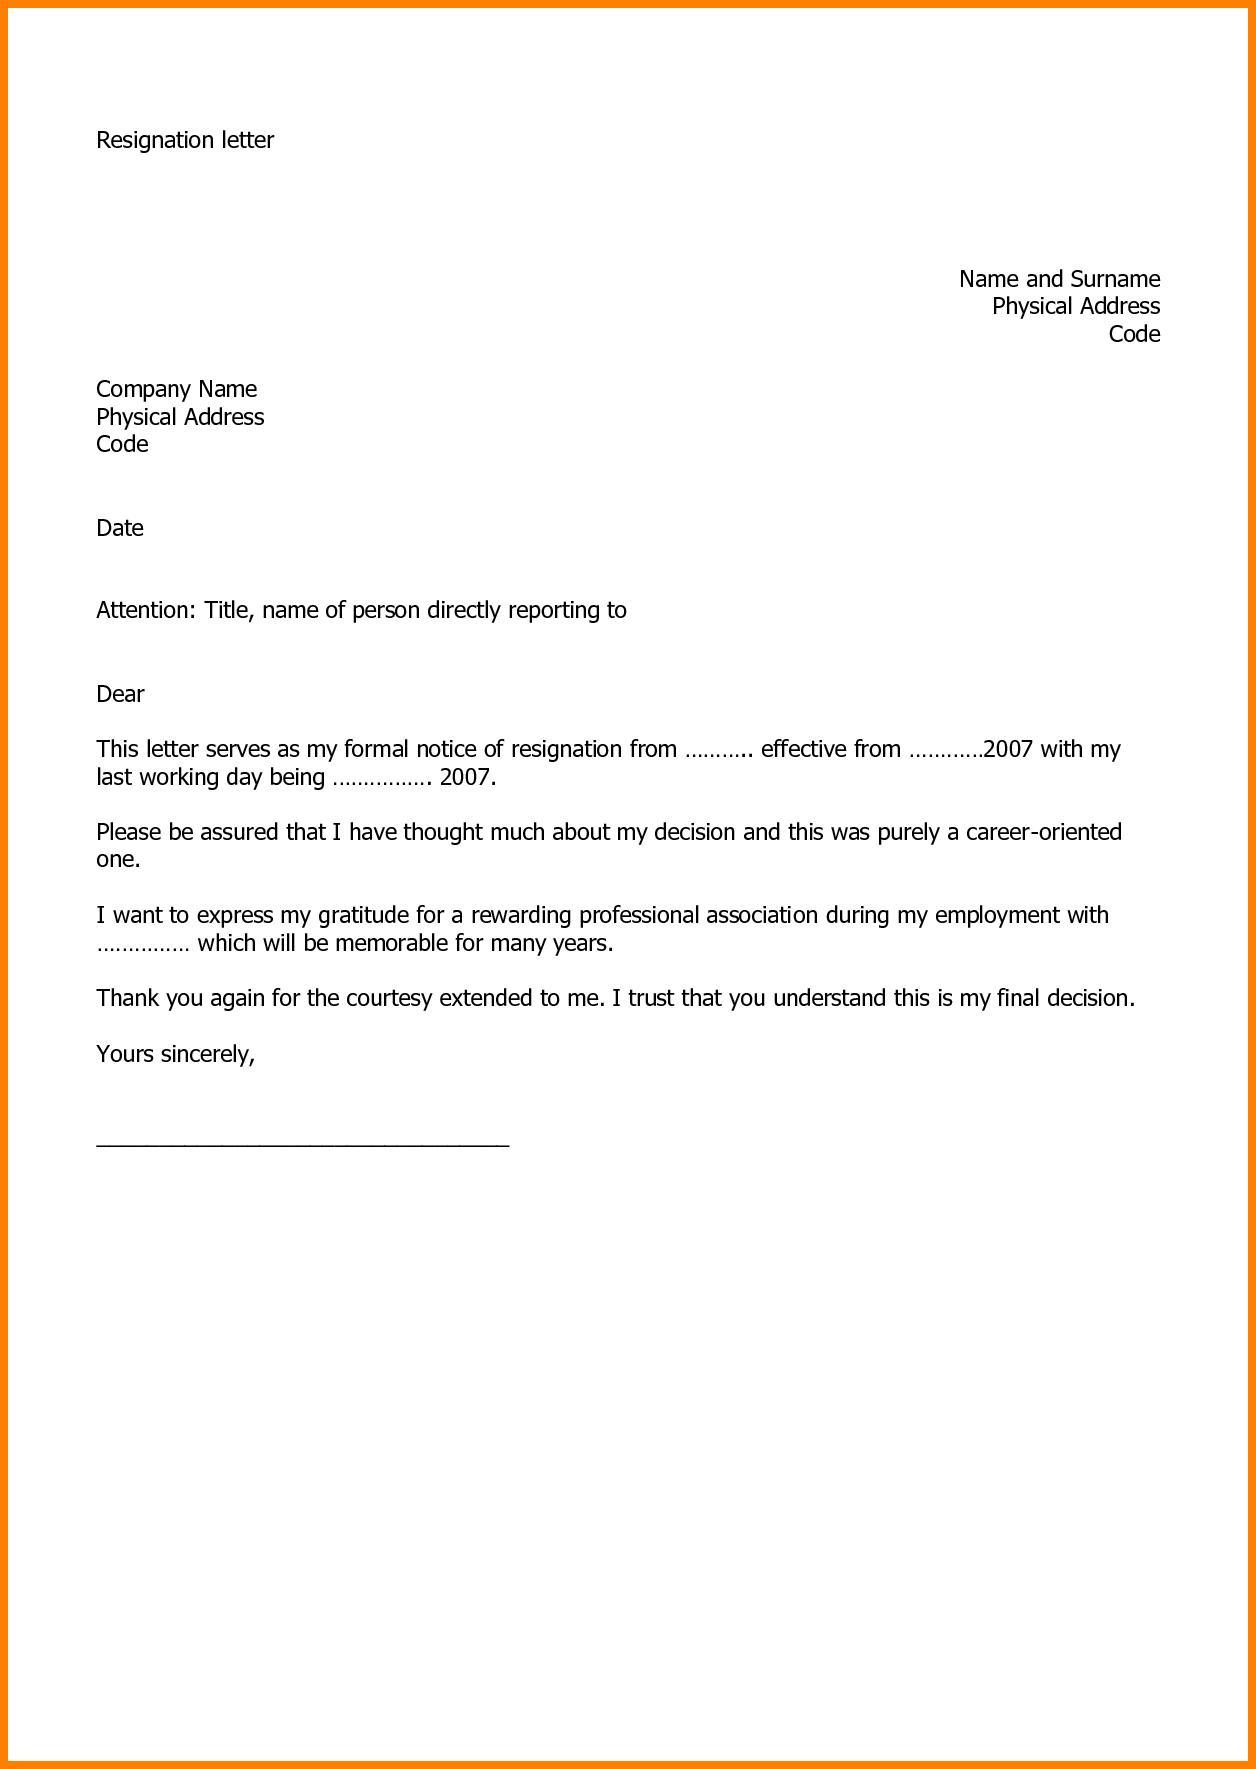 Letter Of Resignation Template Word 2007 - Letter format for Job Resignation Resignation Letter Example